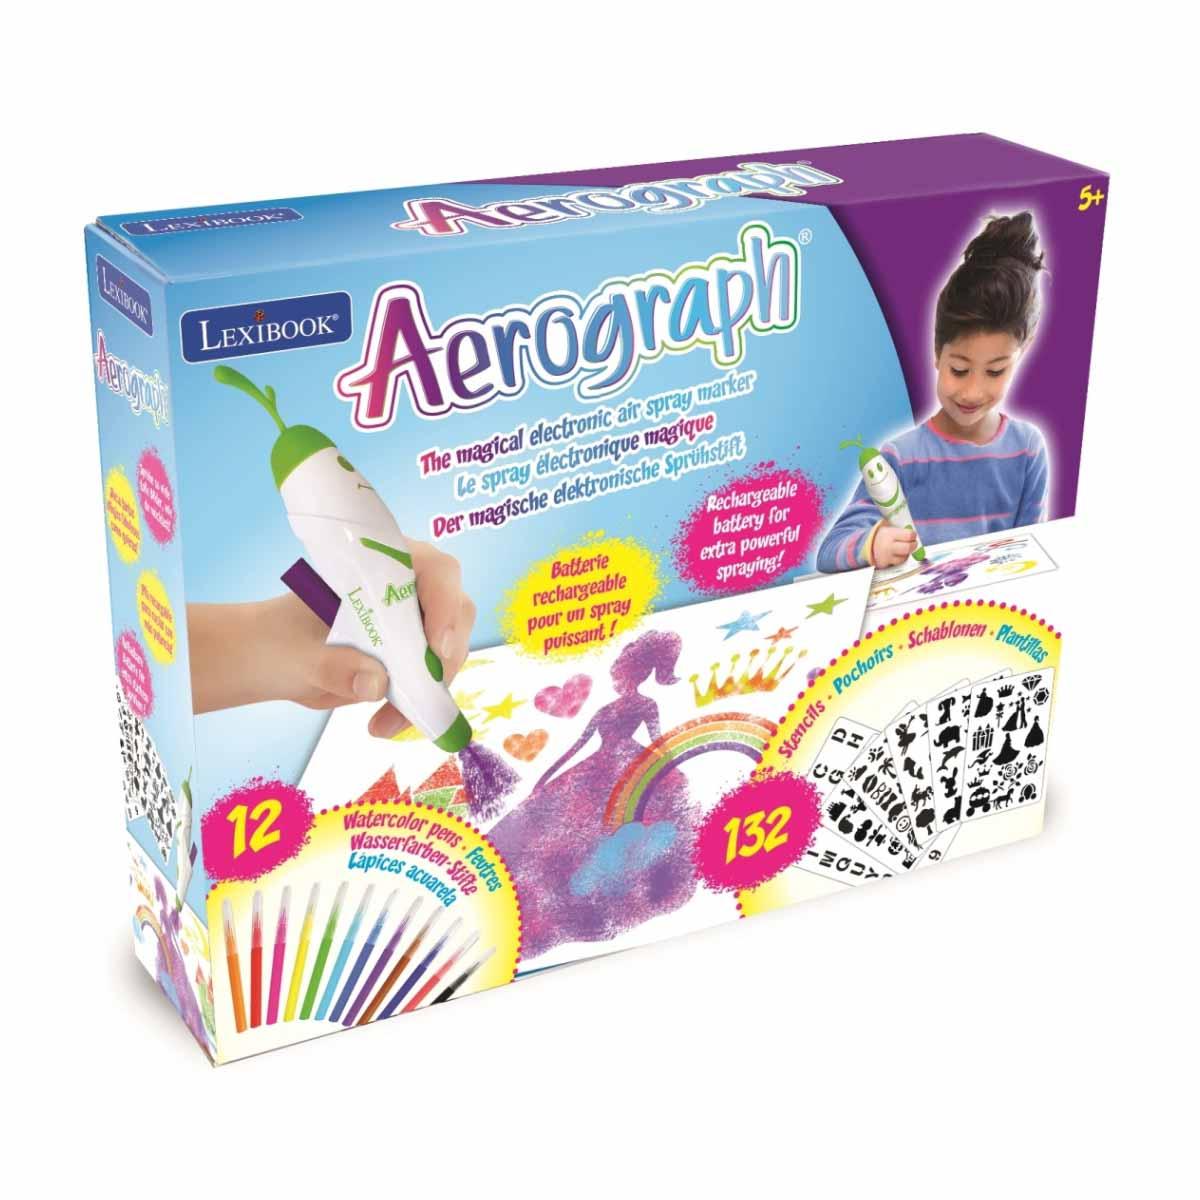 Jucarie interactiva Lexibook. Marker eletronic Aerografh. 12 culori